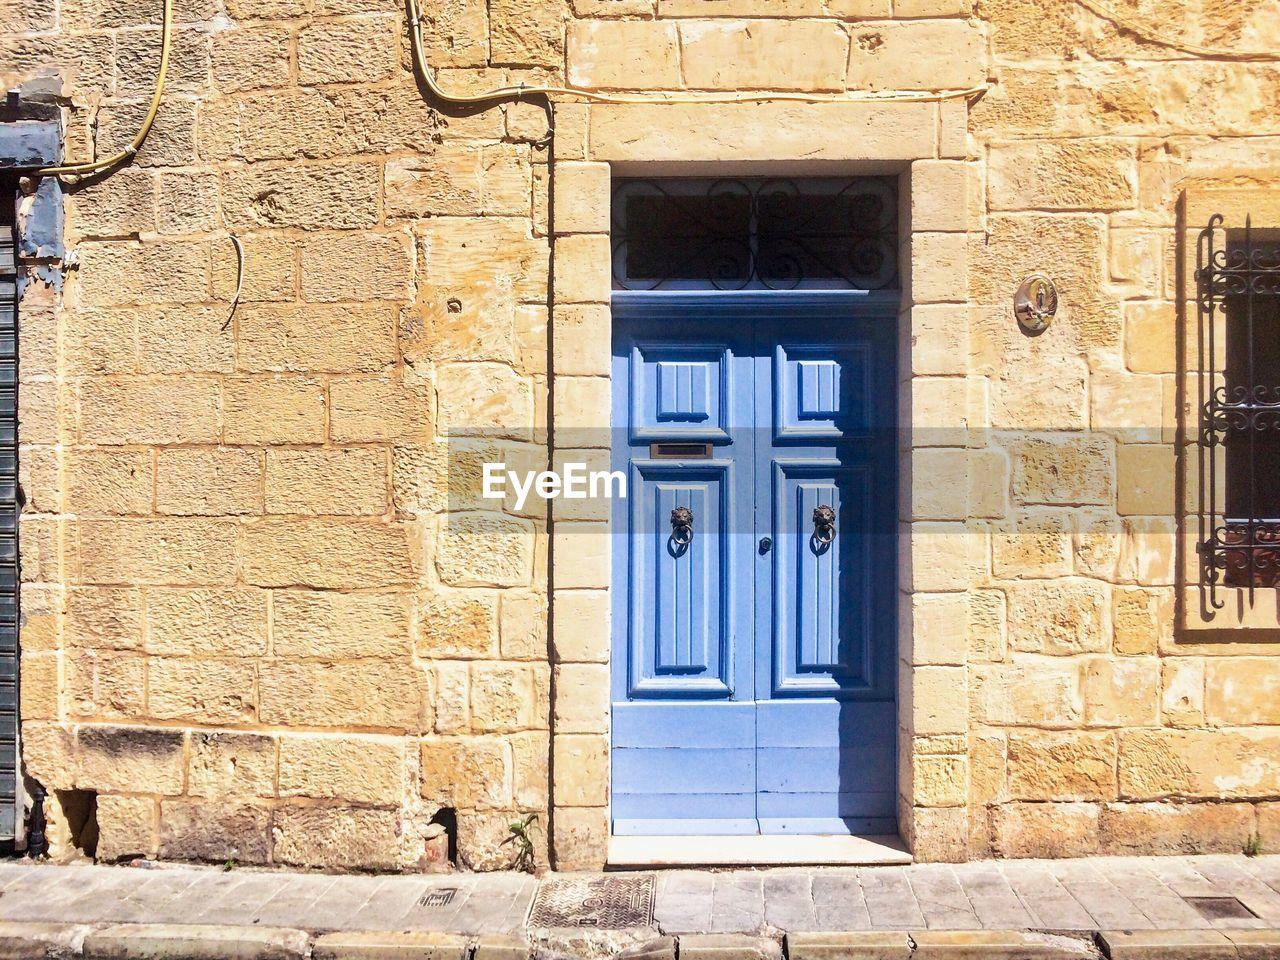 door, closed, architecture, entrance, building exterior, window, built structure, outdoors, no people, day, open door